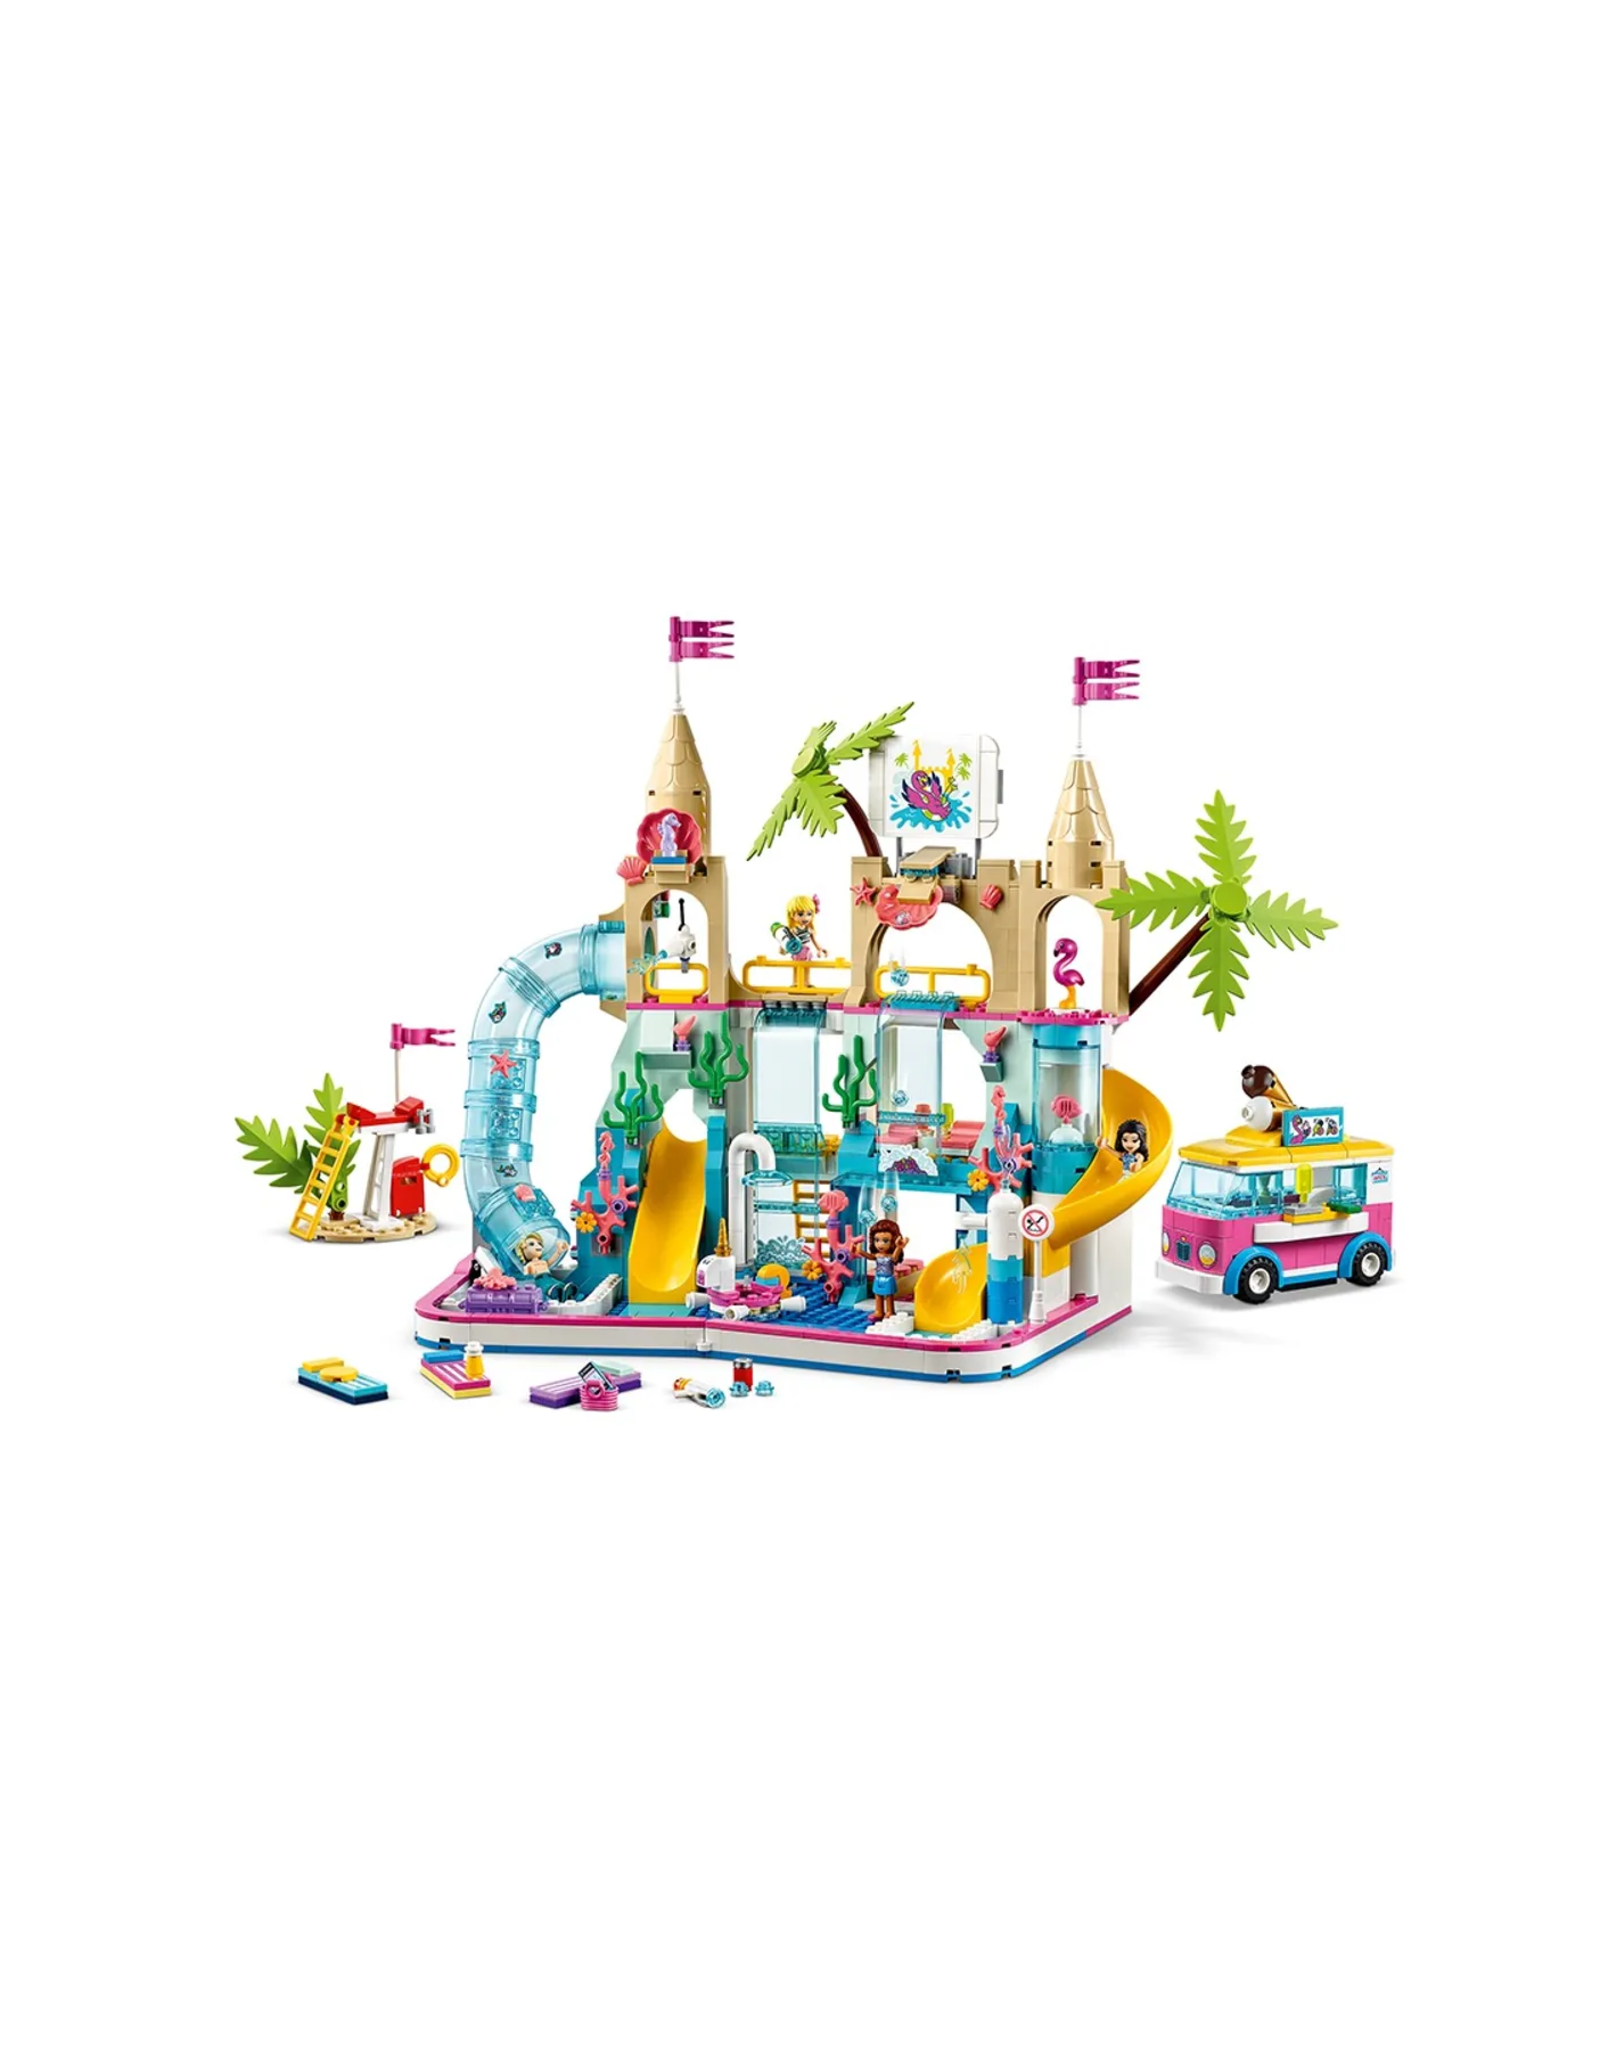 LEGO LEGO Friends: Summer Fun Water Park